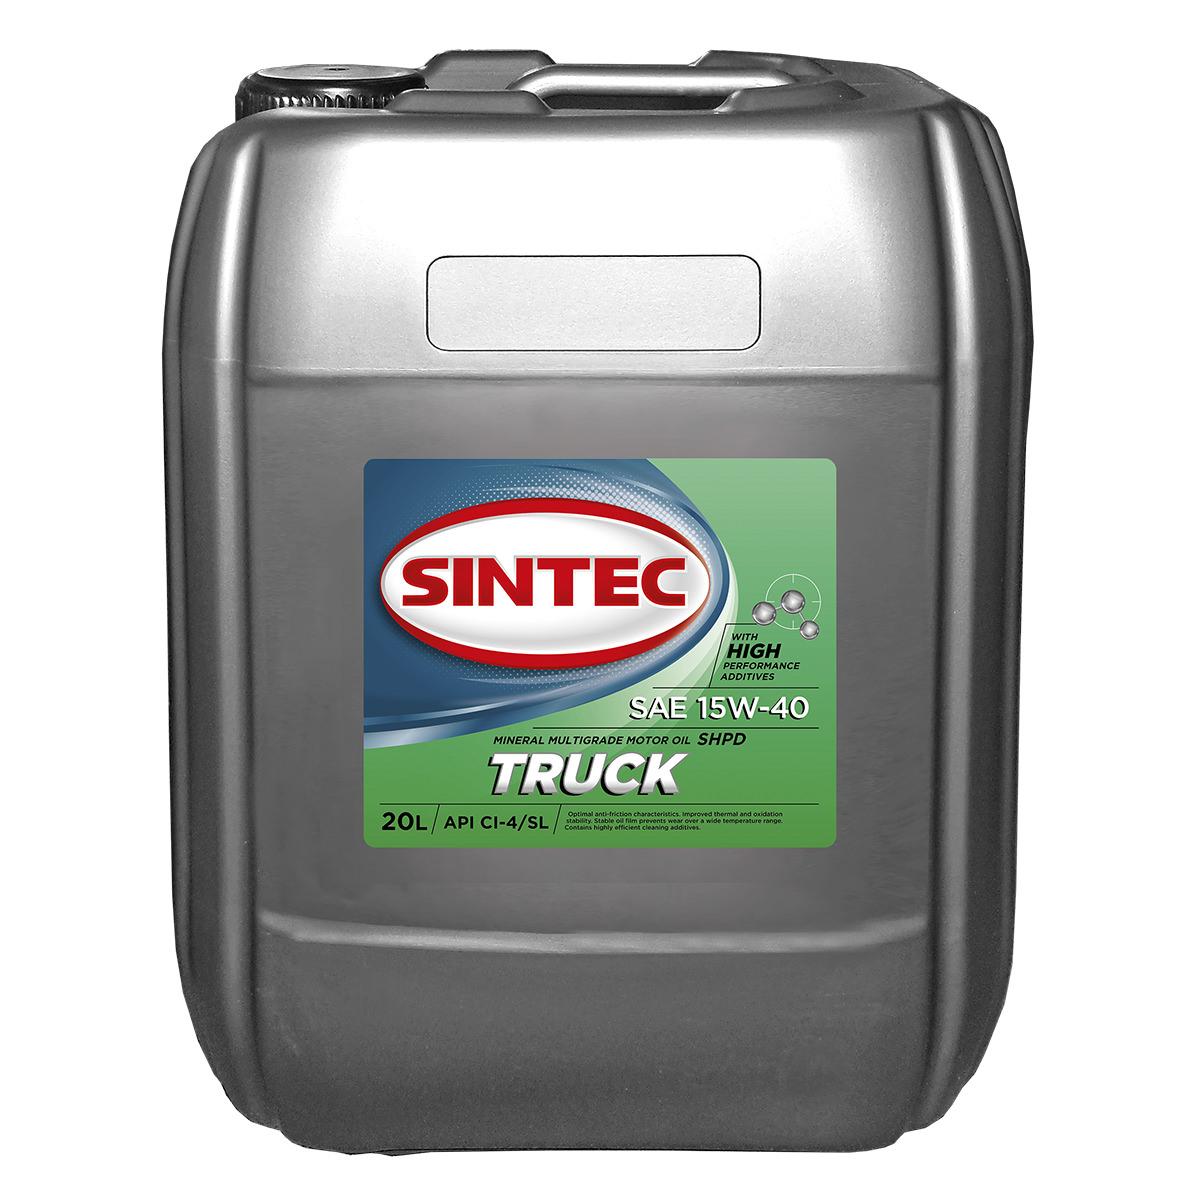 SINTEC TRUCK SAE 15W-40 API CI-4/SL